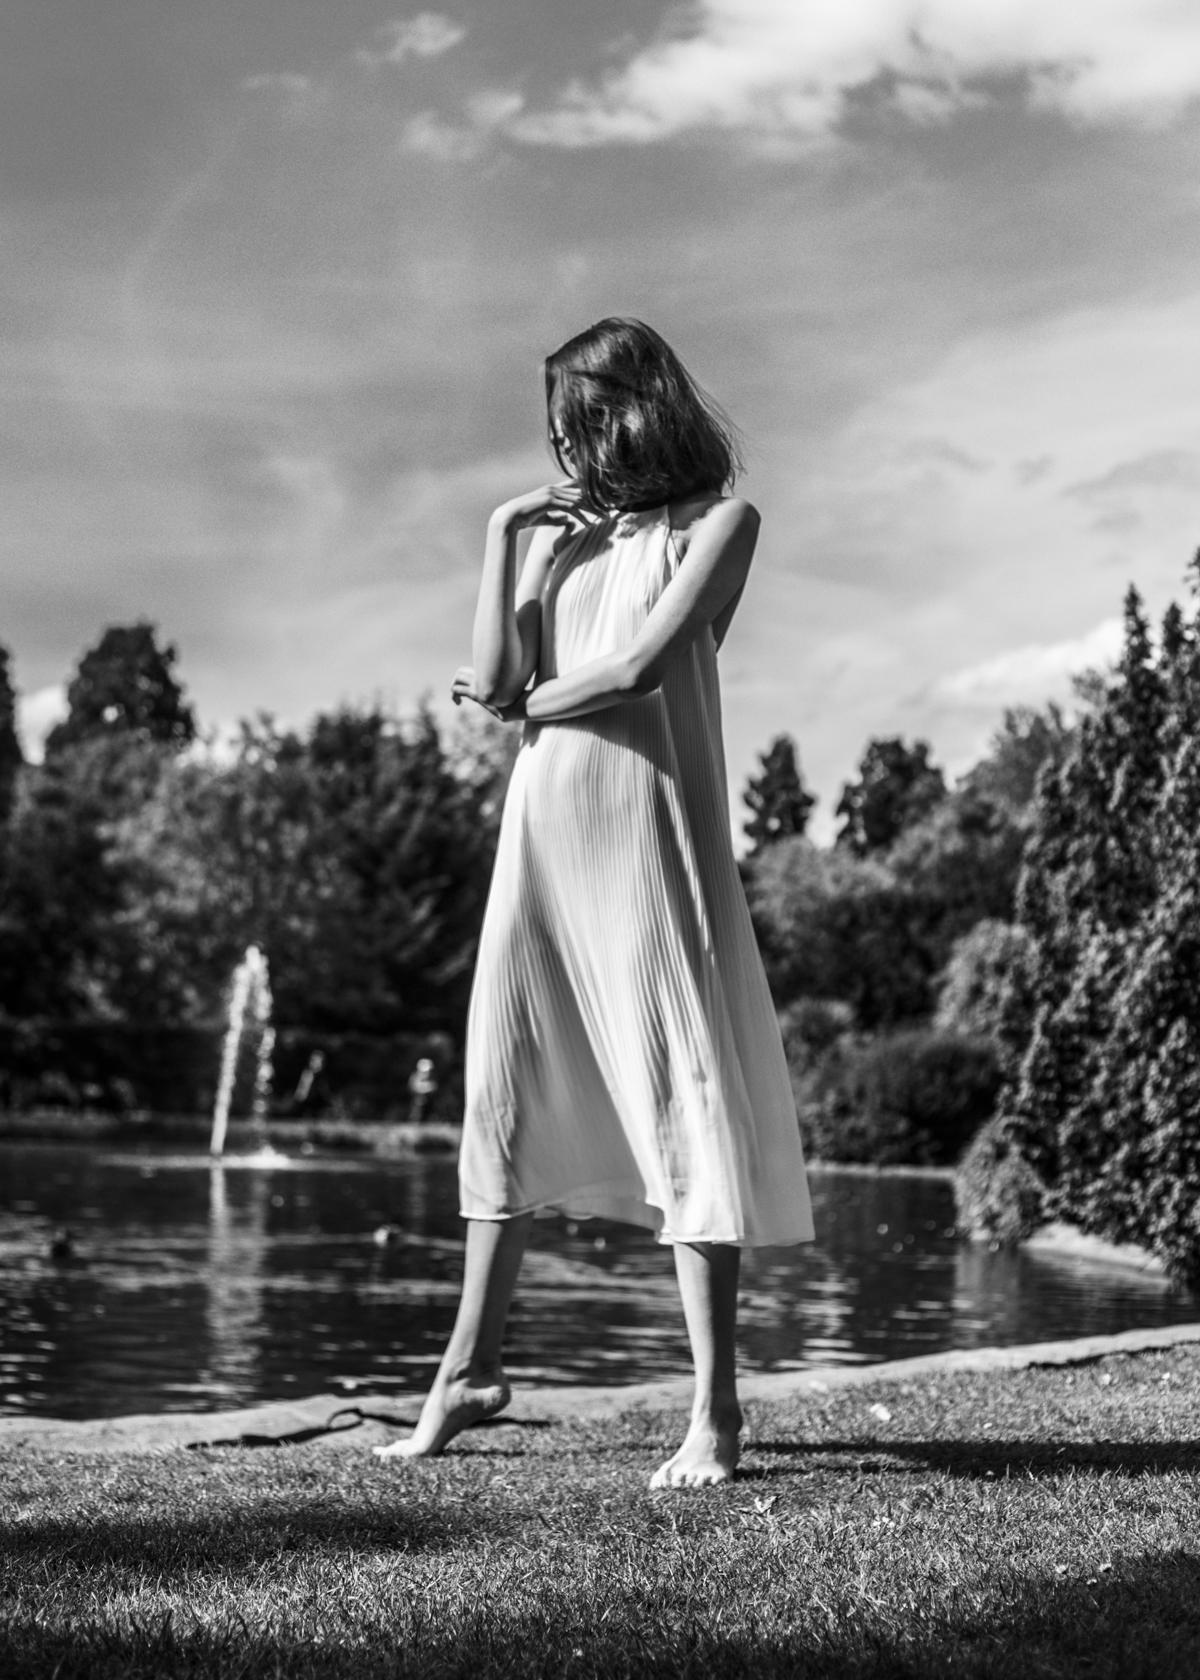 Kat_Terek_London_Bohemian_Editorial_Fashion_Photographer_Lindenstaub_Forest_Lucys_Magazine-6